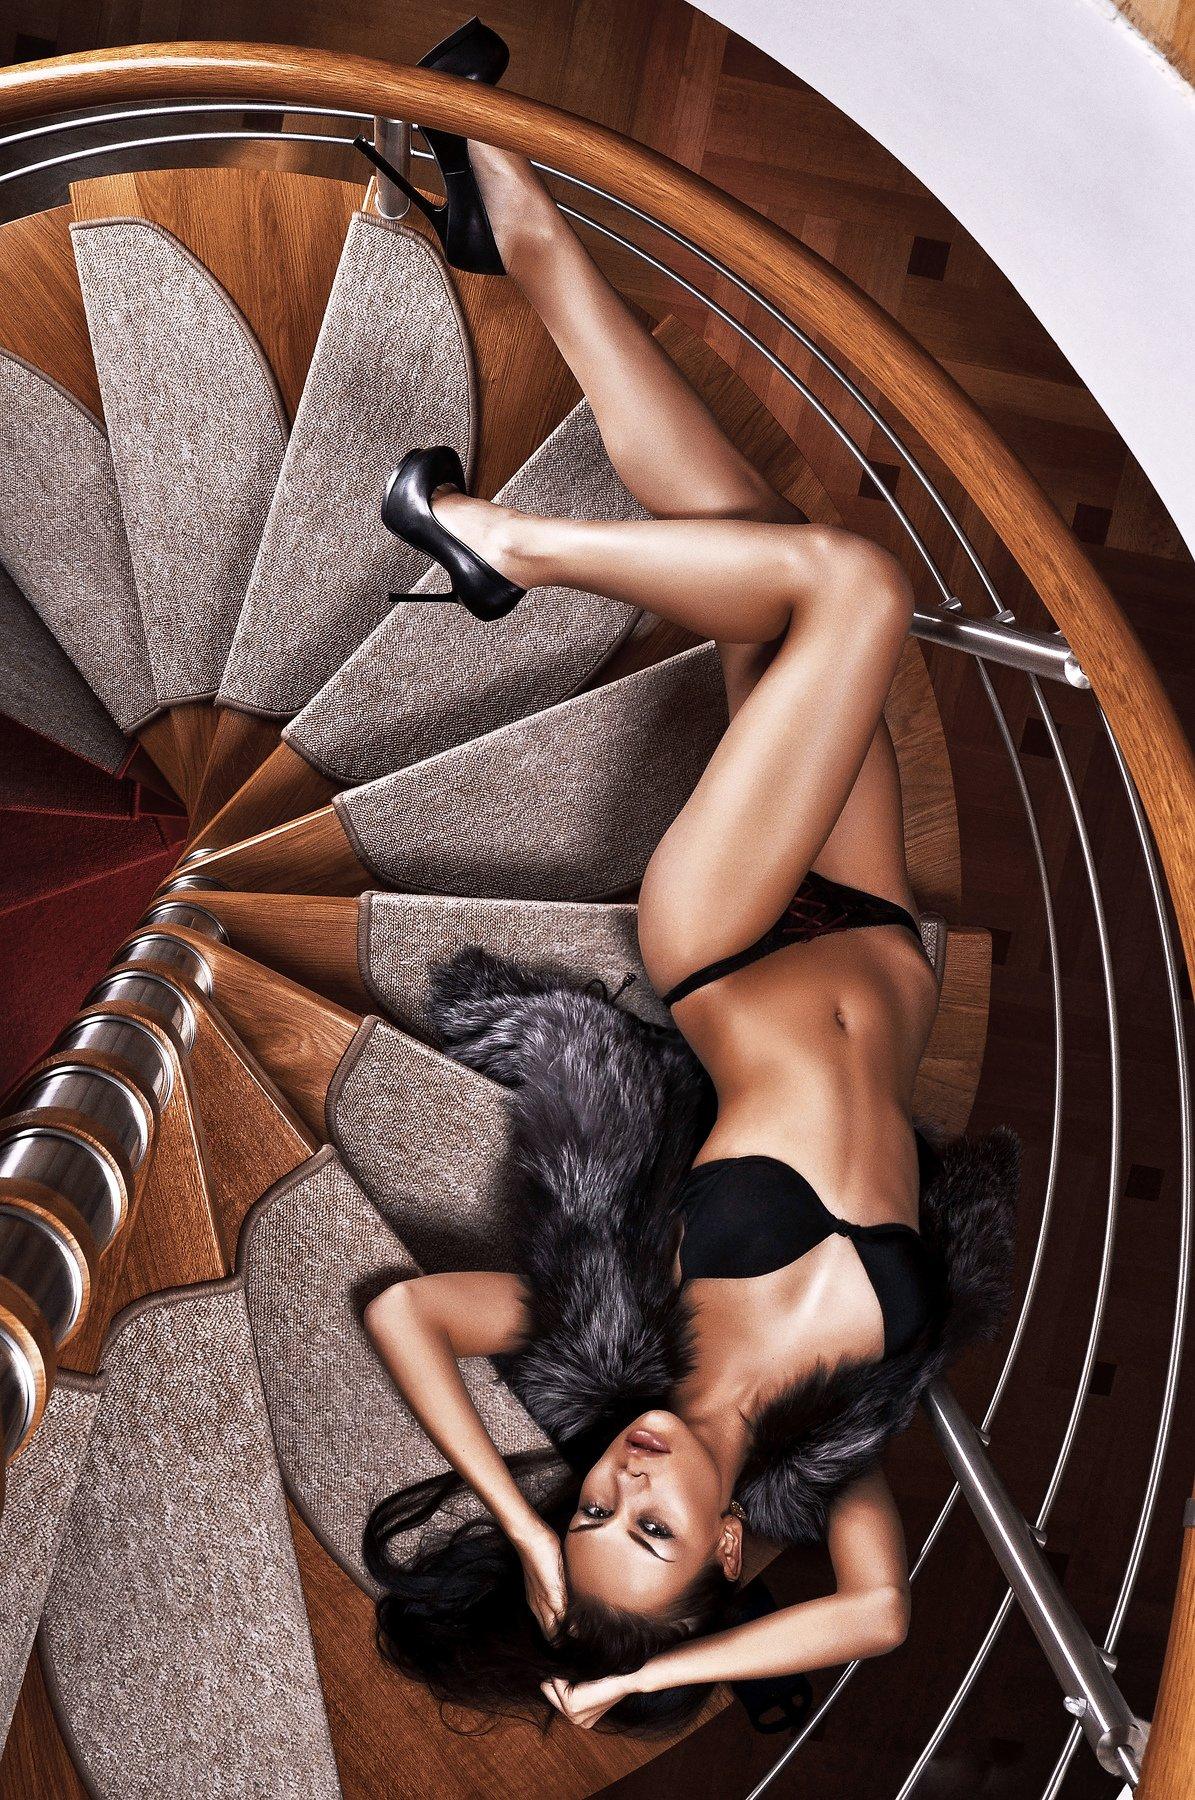 лестница, спираль, девушка, Прозвицкий Сергей